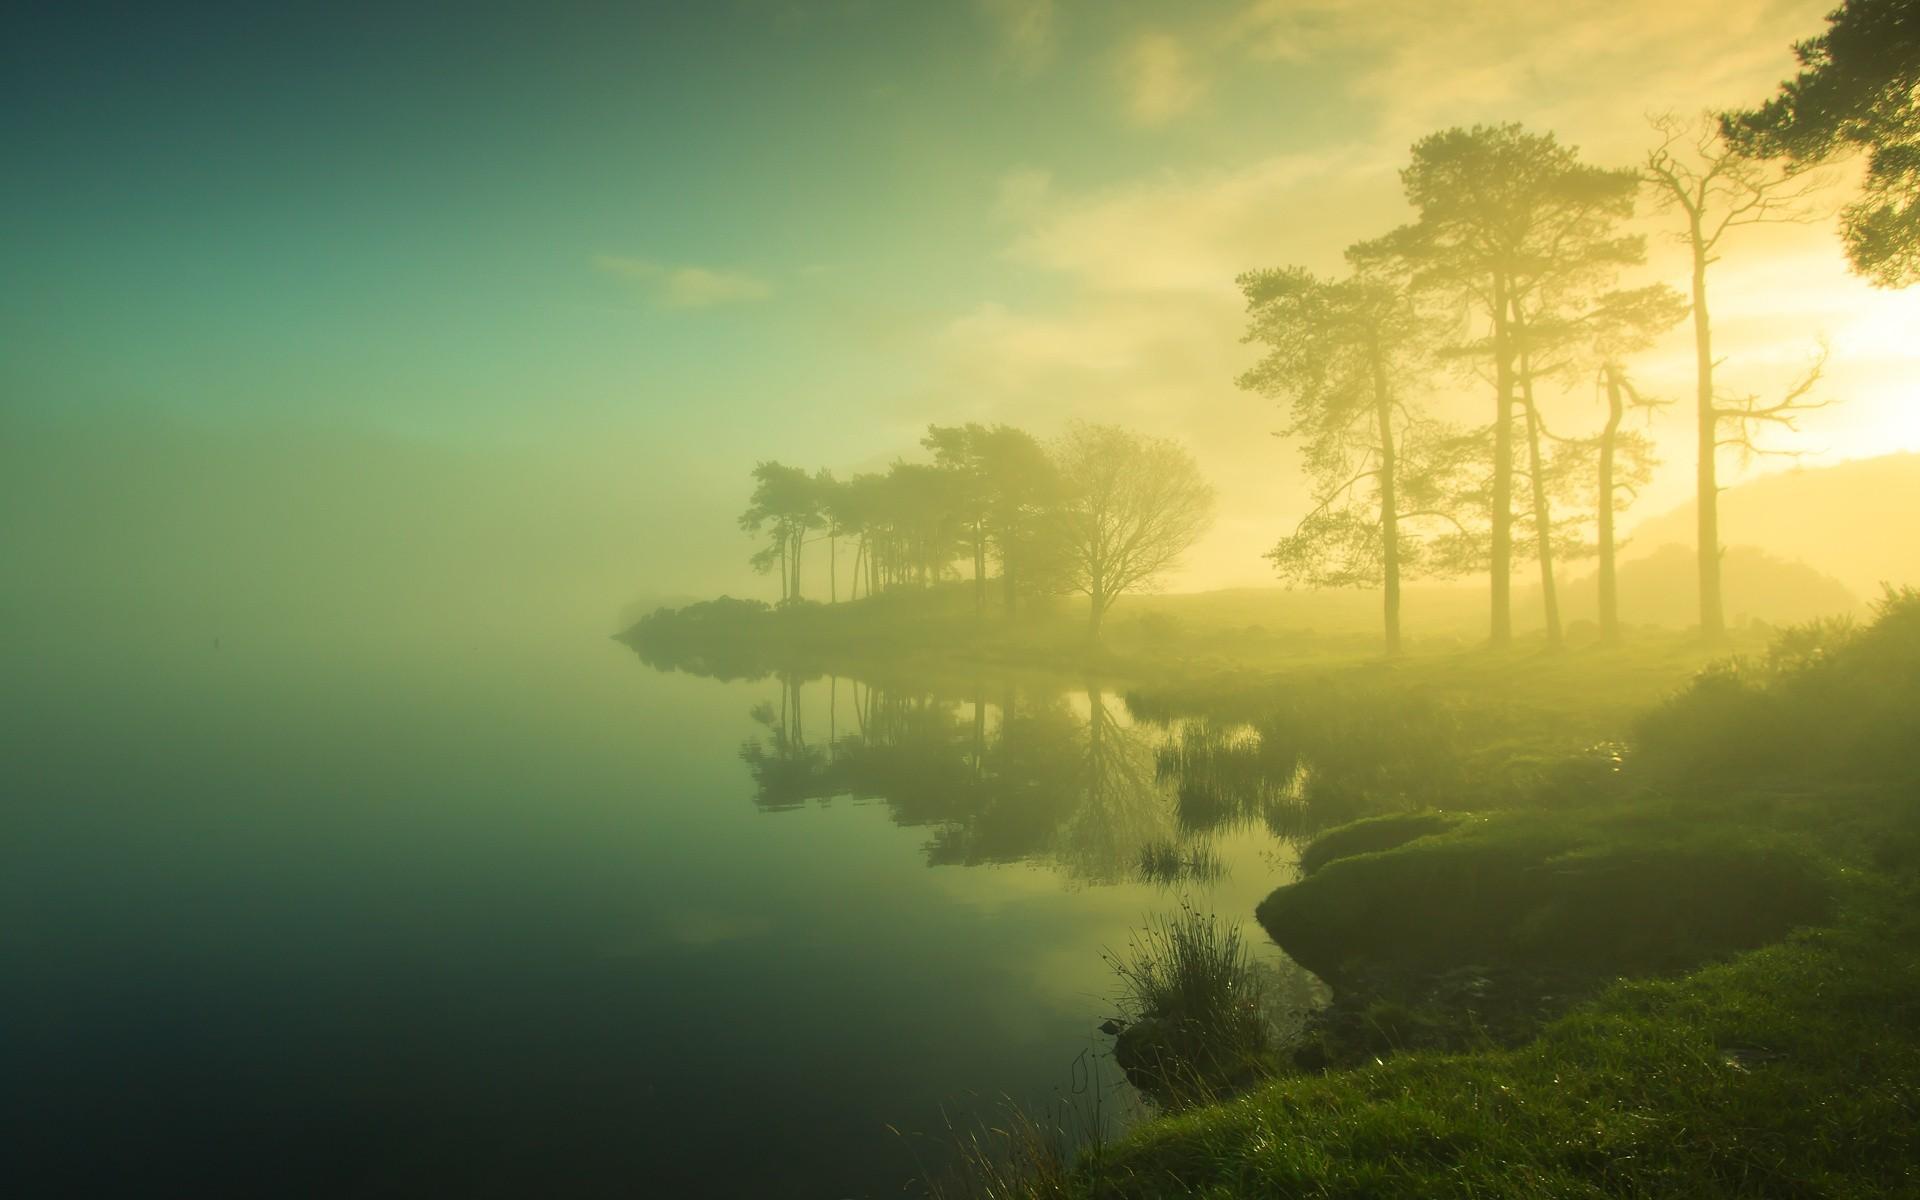 calming desktop wallpaper calm – photo #4. Fight Email Apnea With One  Breath lifehackercom